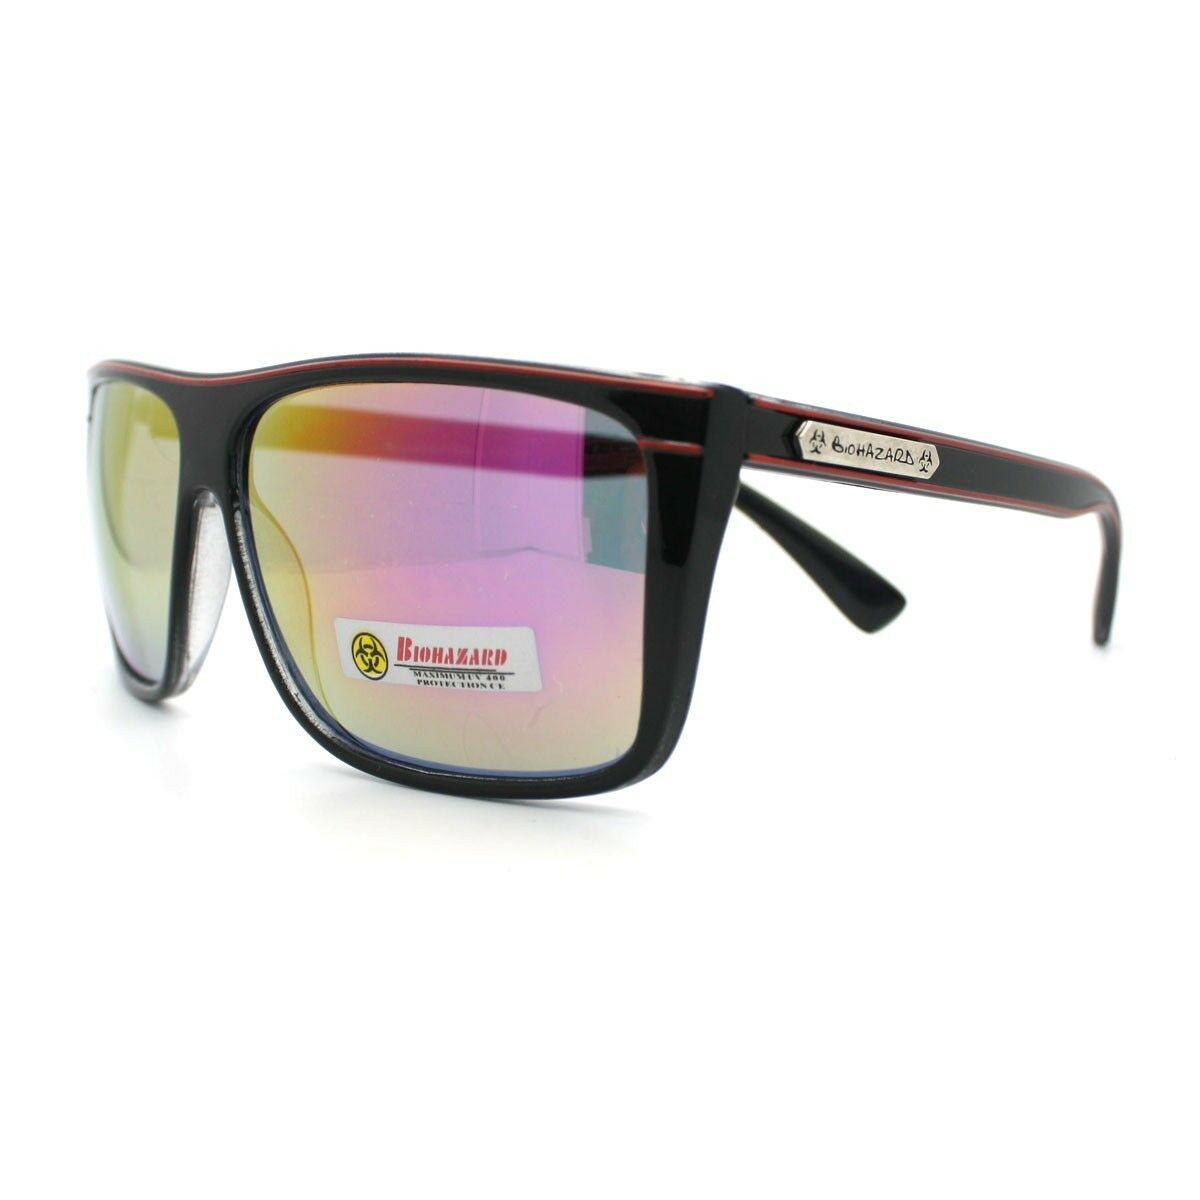 6ebd4aa81a1 Biohazard Sunglasses Mens Square Sporty Skater Fashion Frame Black ...